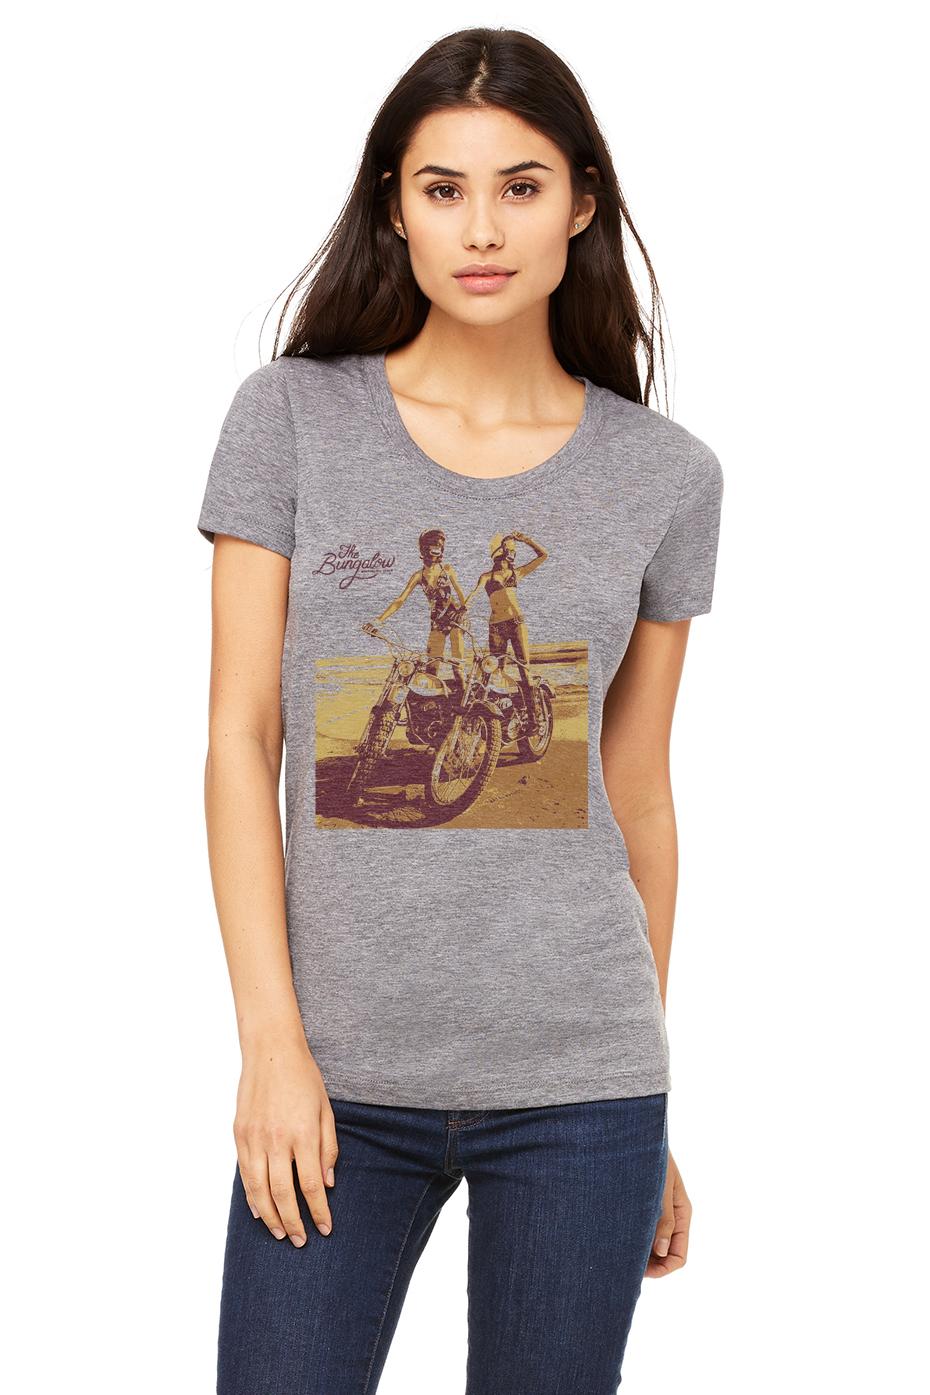 MOTO GIRLS HEATHER GREY